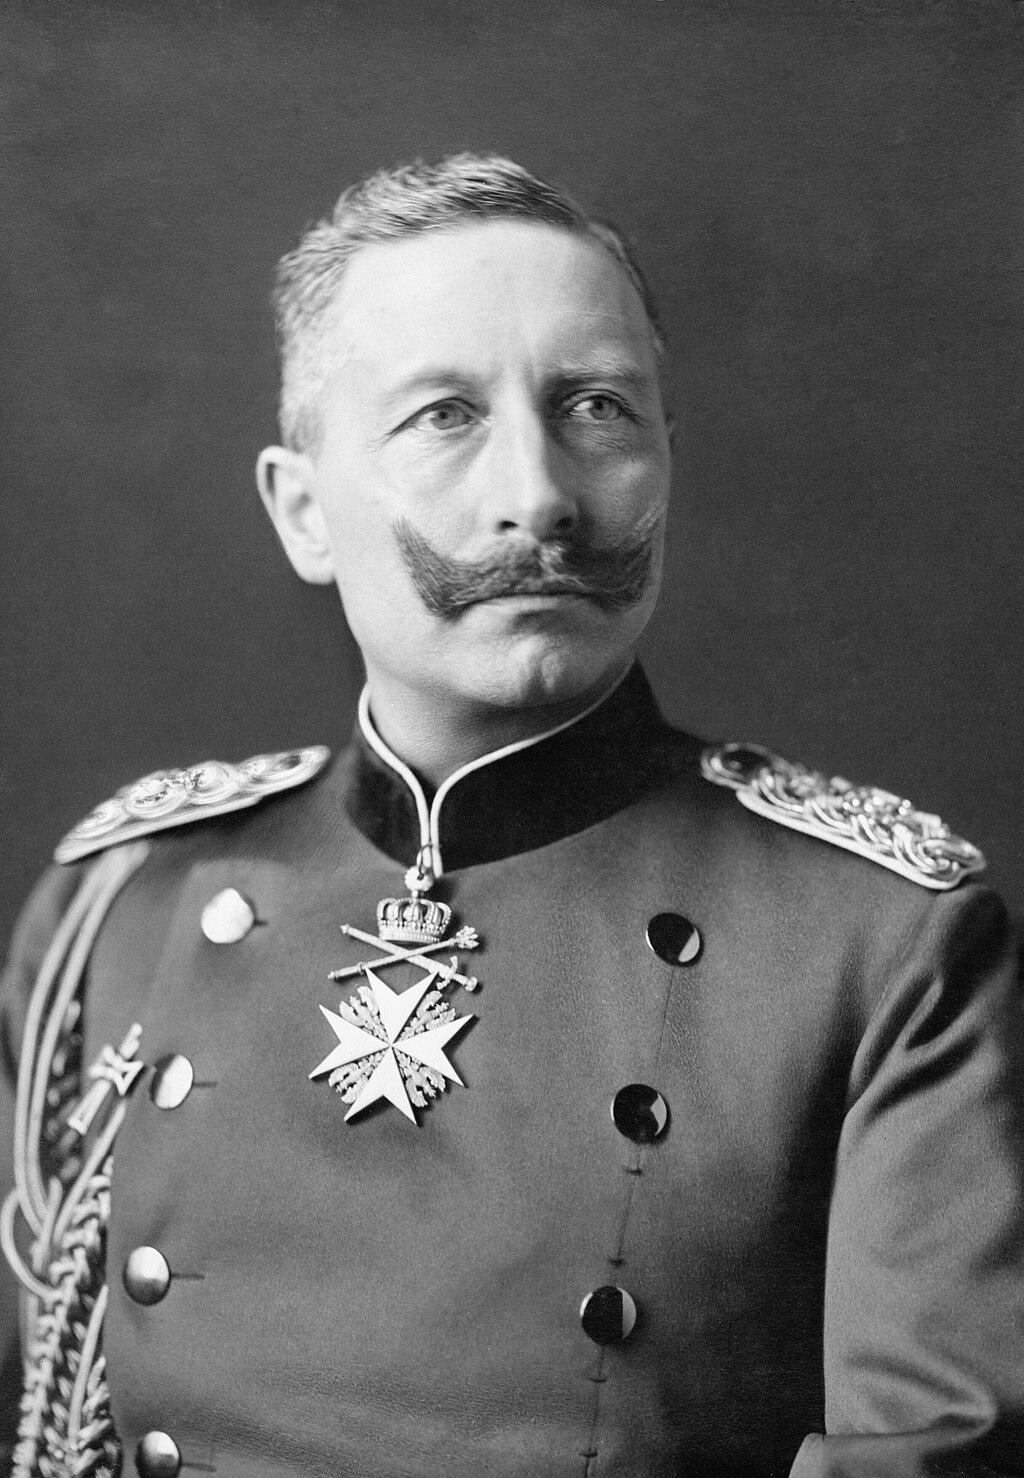 [Image: 1024px-Kaiser_Wilhelm_II_of_Germany_-_1902.jpg]